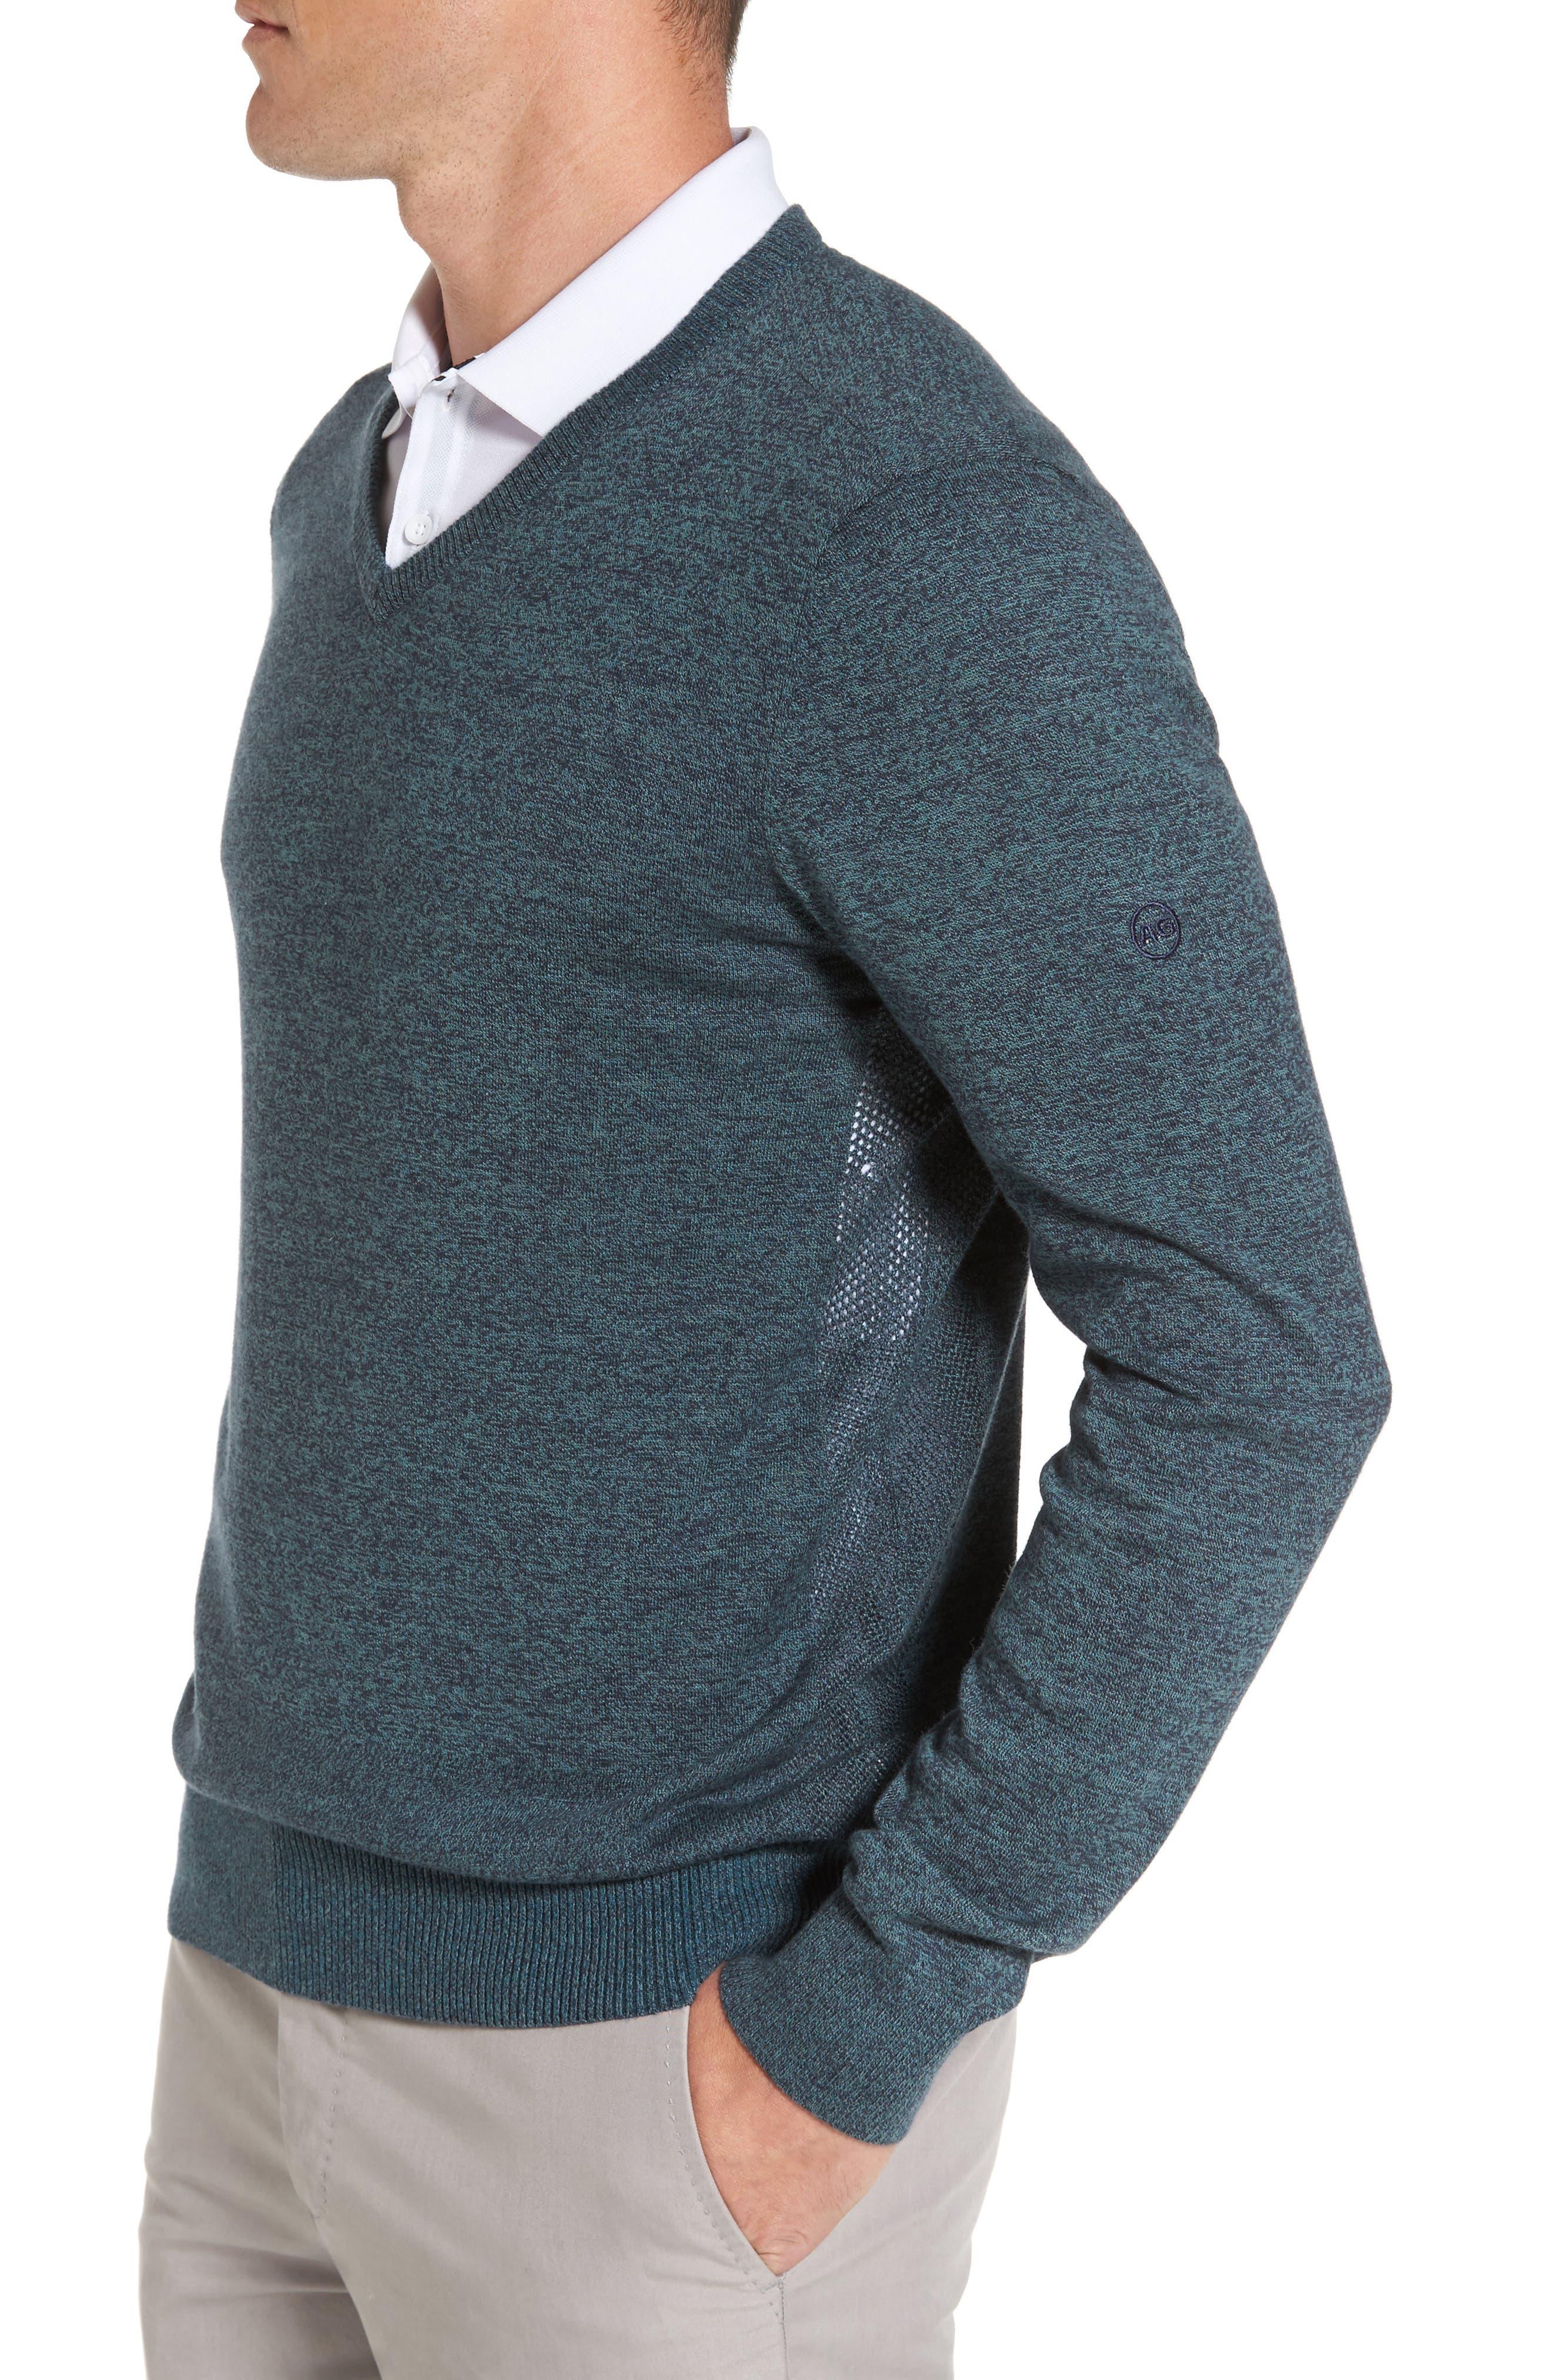 Ridgewood V-Neck Sweater,                             Alternate thumbnail 3, color,                             Turf/ Naval Blue Melange